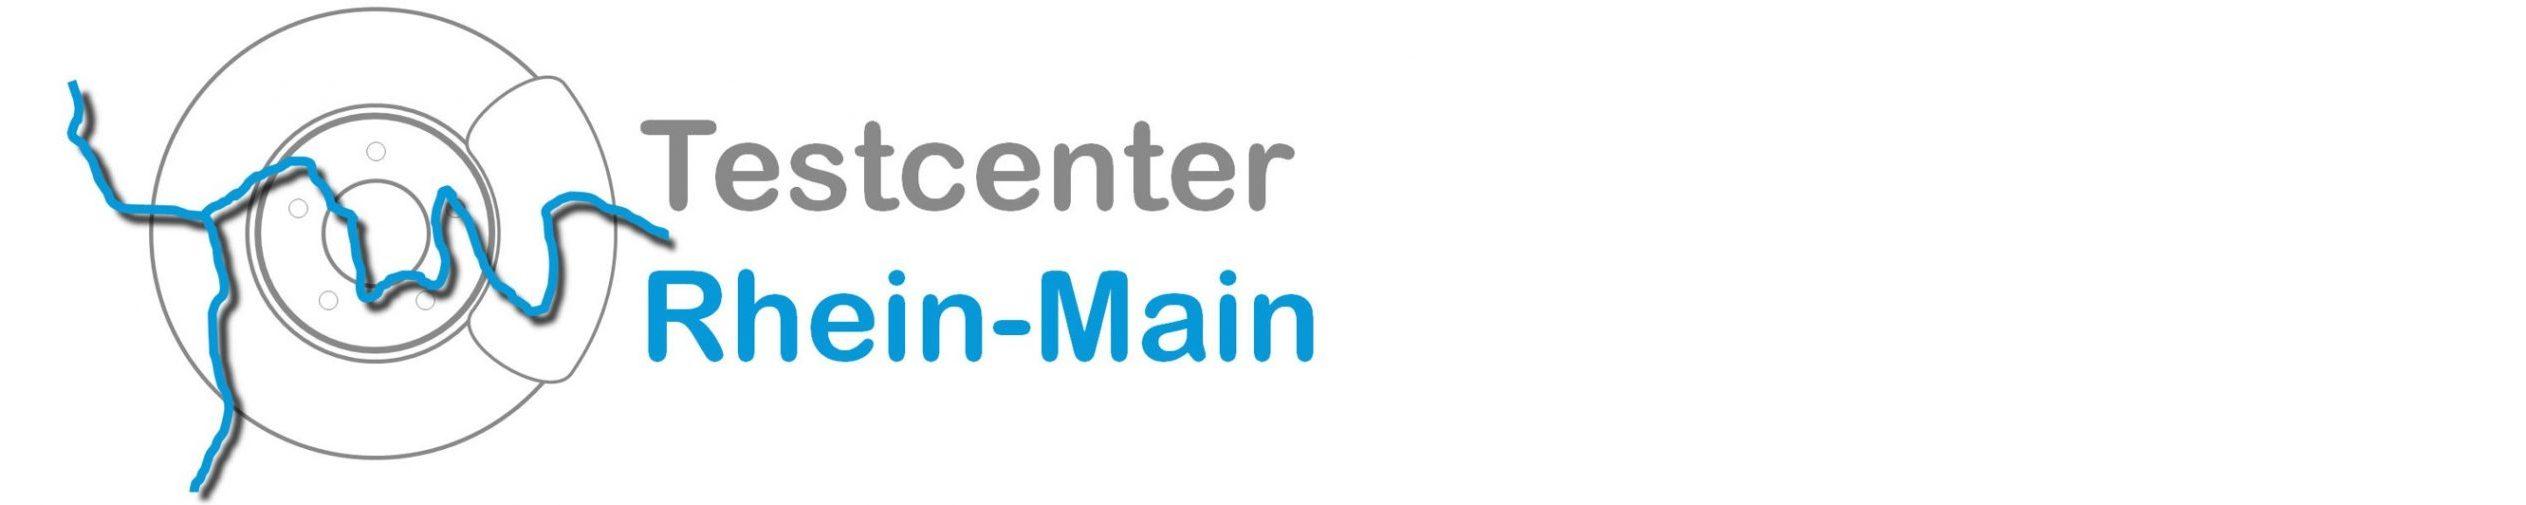 Testcenter Rhein-Main GmbH